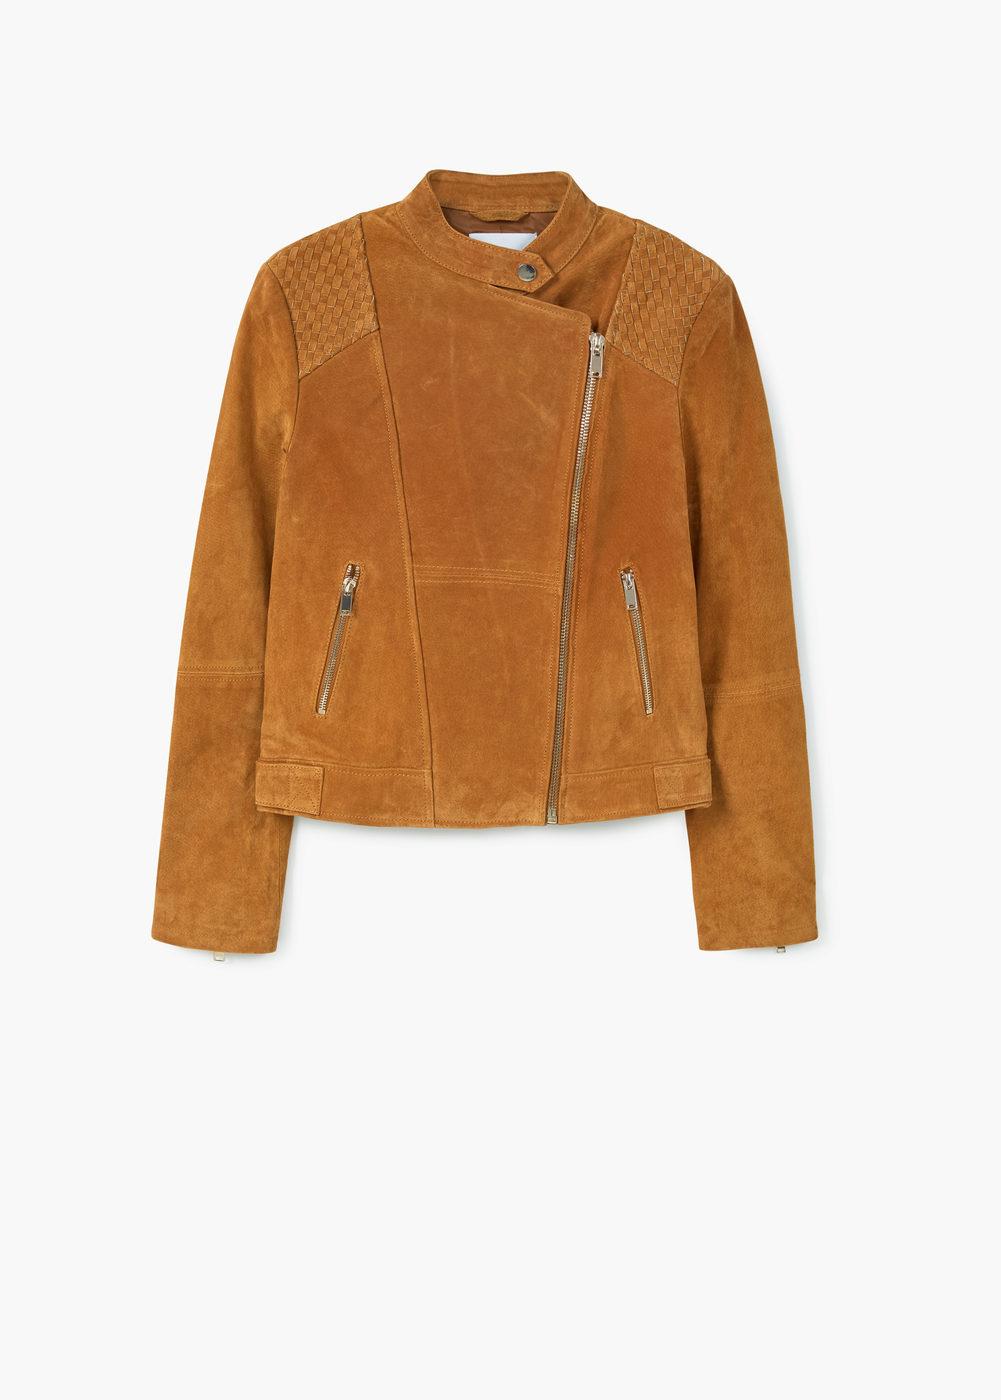 Shop Fall Outerwear 🍒 DNAMAG.co